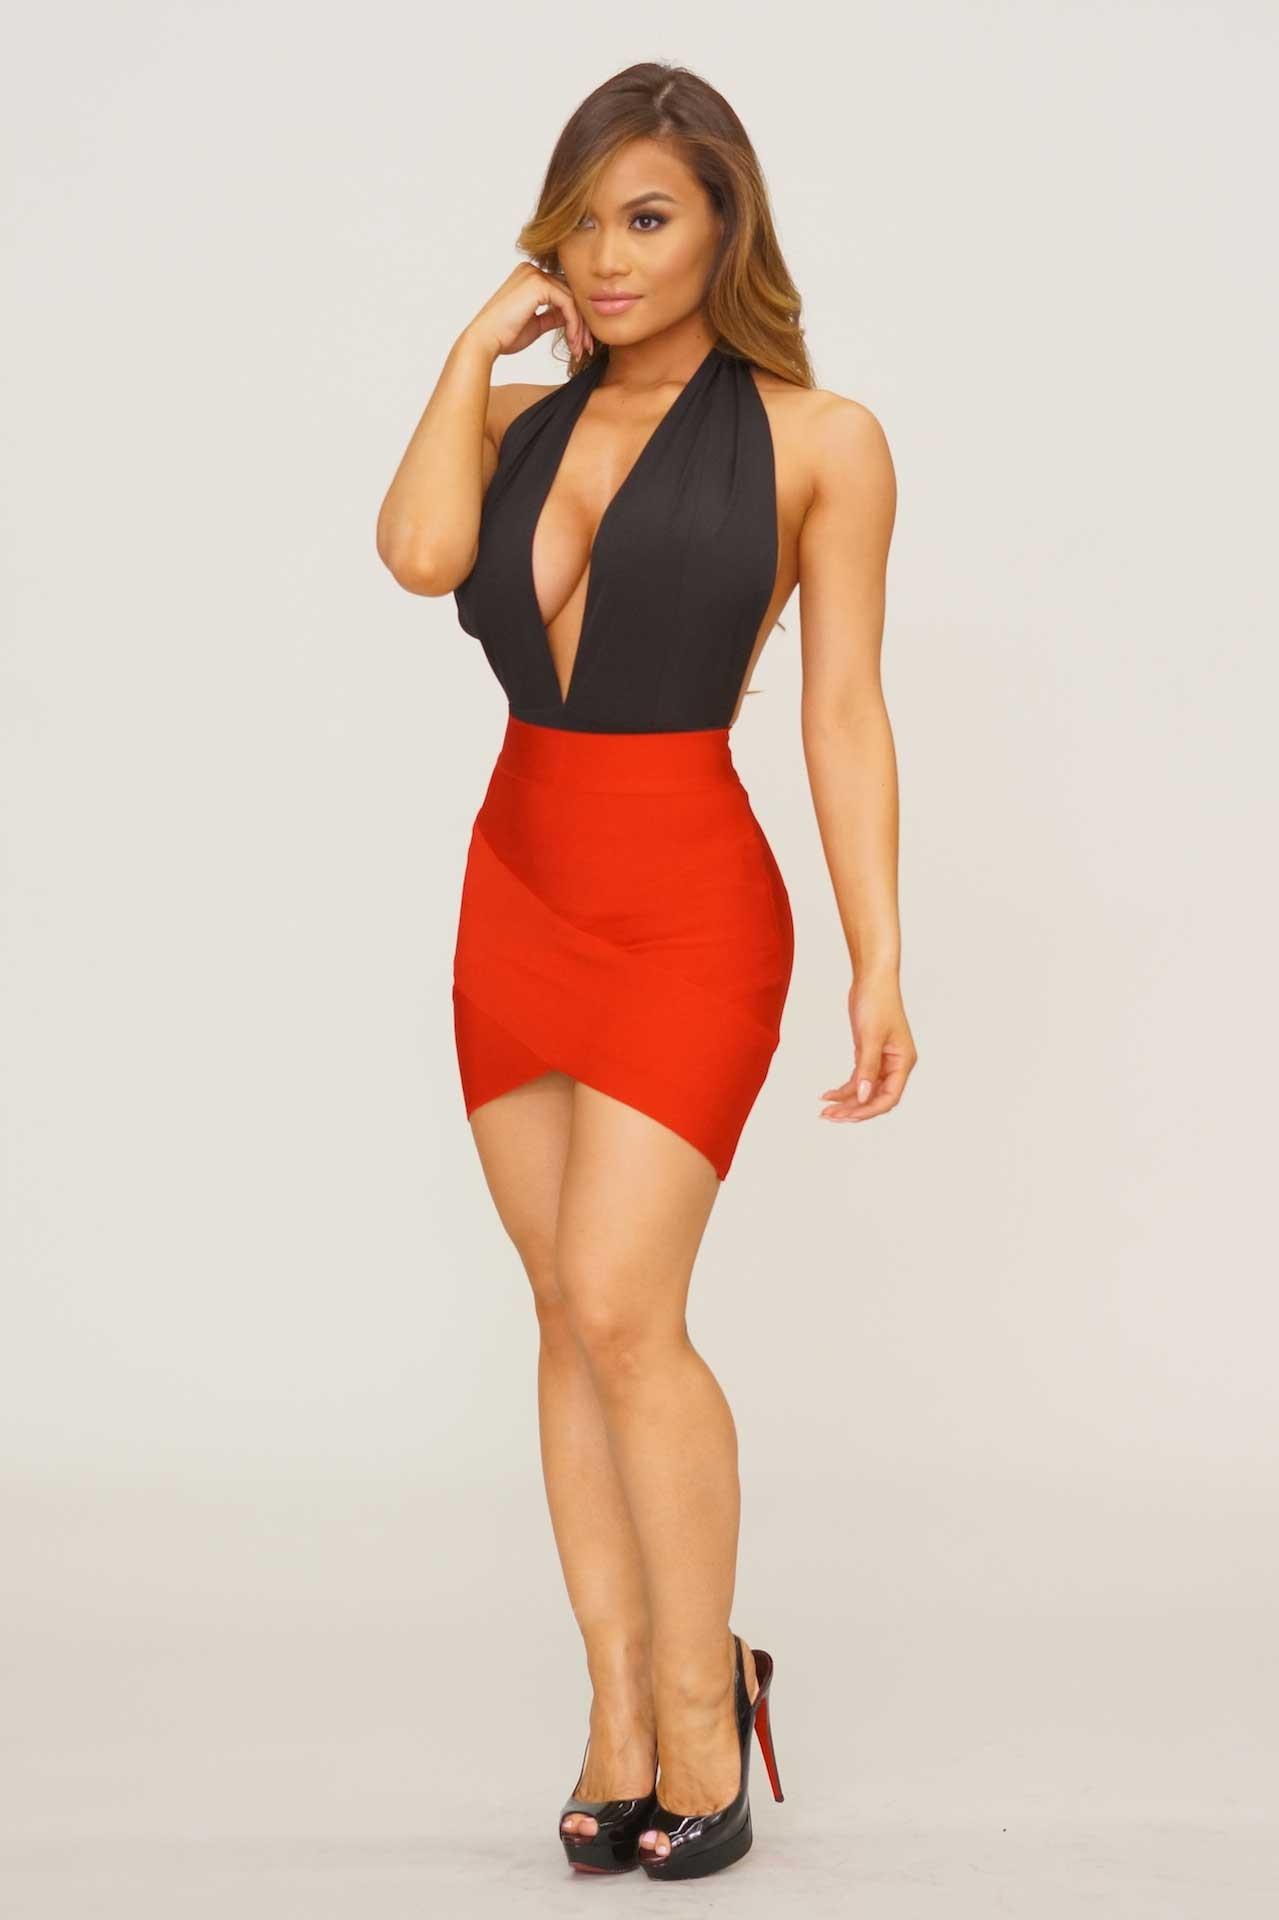 bandage skirts arched up bandage skirt - red TQQCXGQ